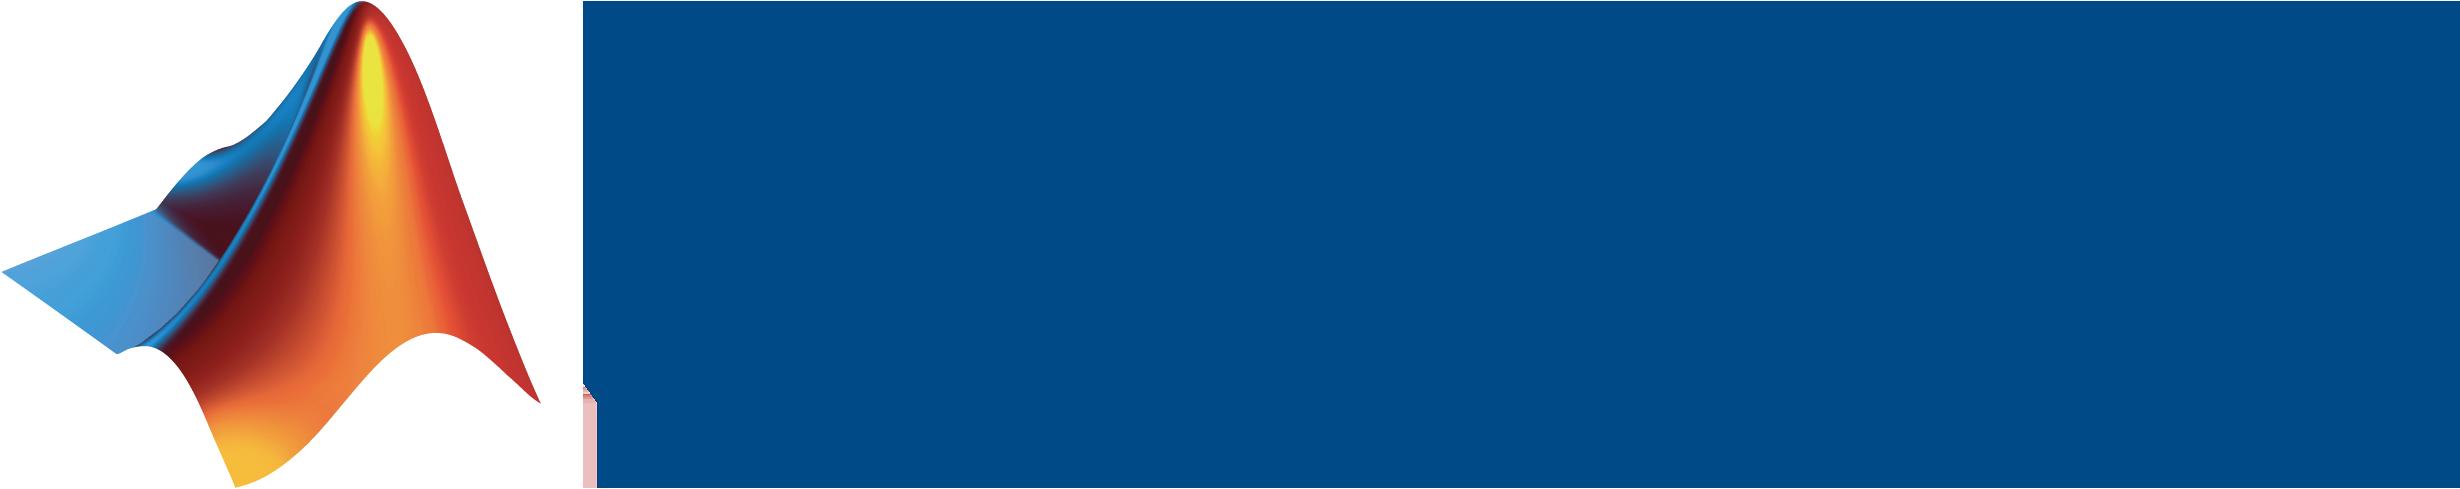 09_MathWorks_logo_RGB_transparent.png